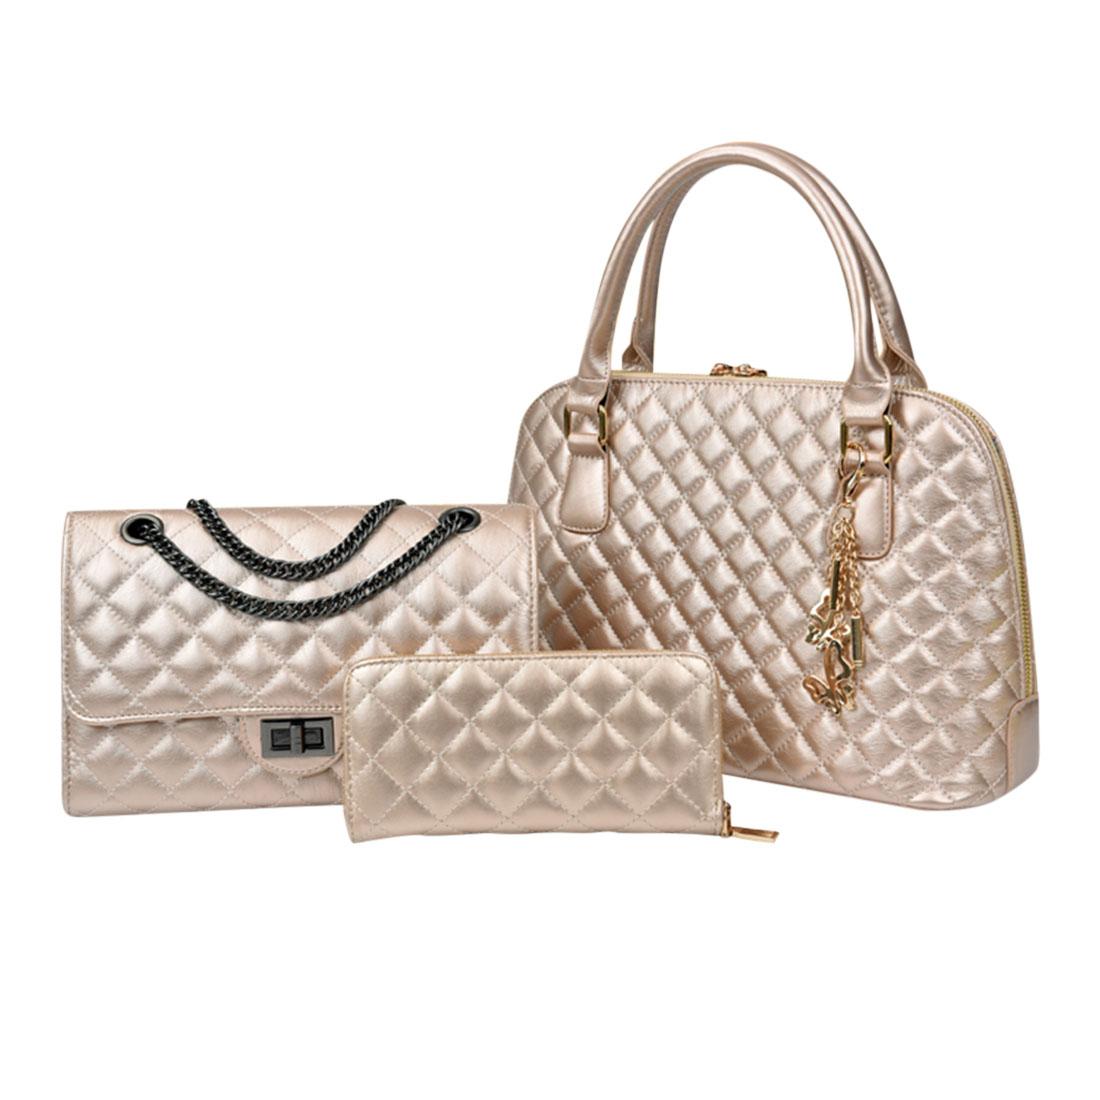 Luxury women Lady 3 Piece Quilting Lash Package Multiple Purse Chain shoulder Crossbody Bag Handbag(China (Mainland))